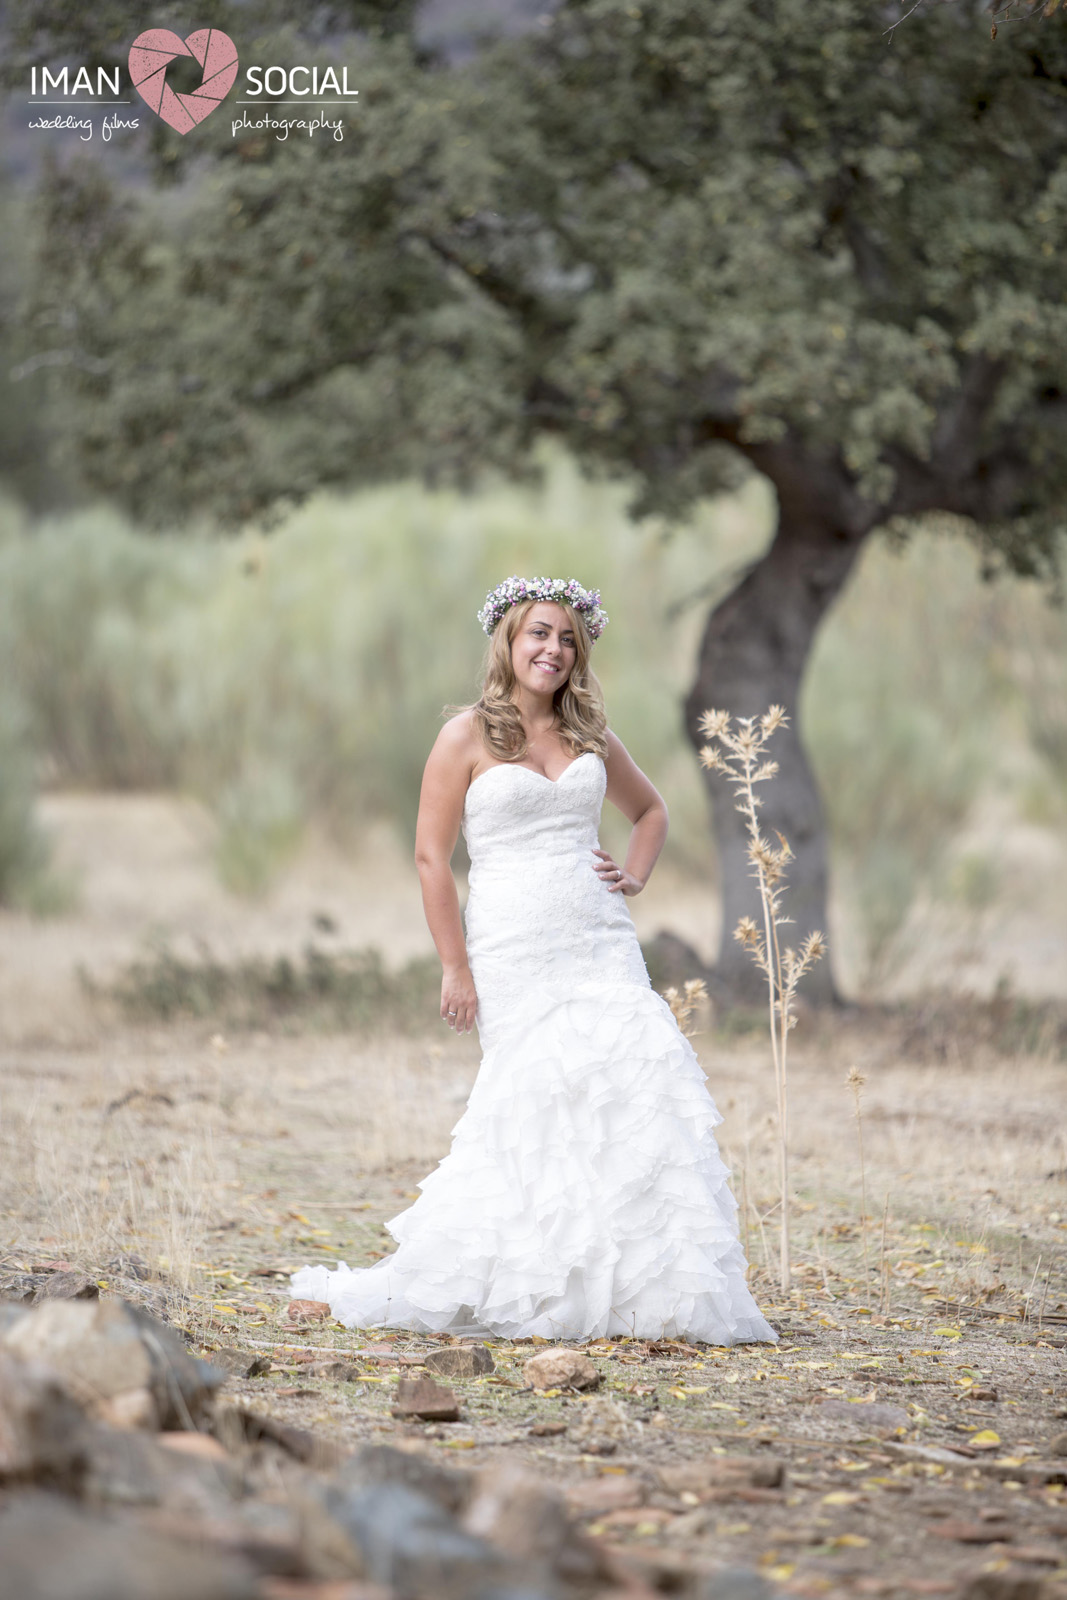 77B0042 Juan Antonio y Mónica - Postboda - video boda cordoba